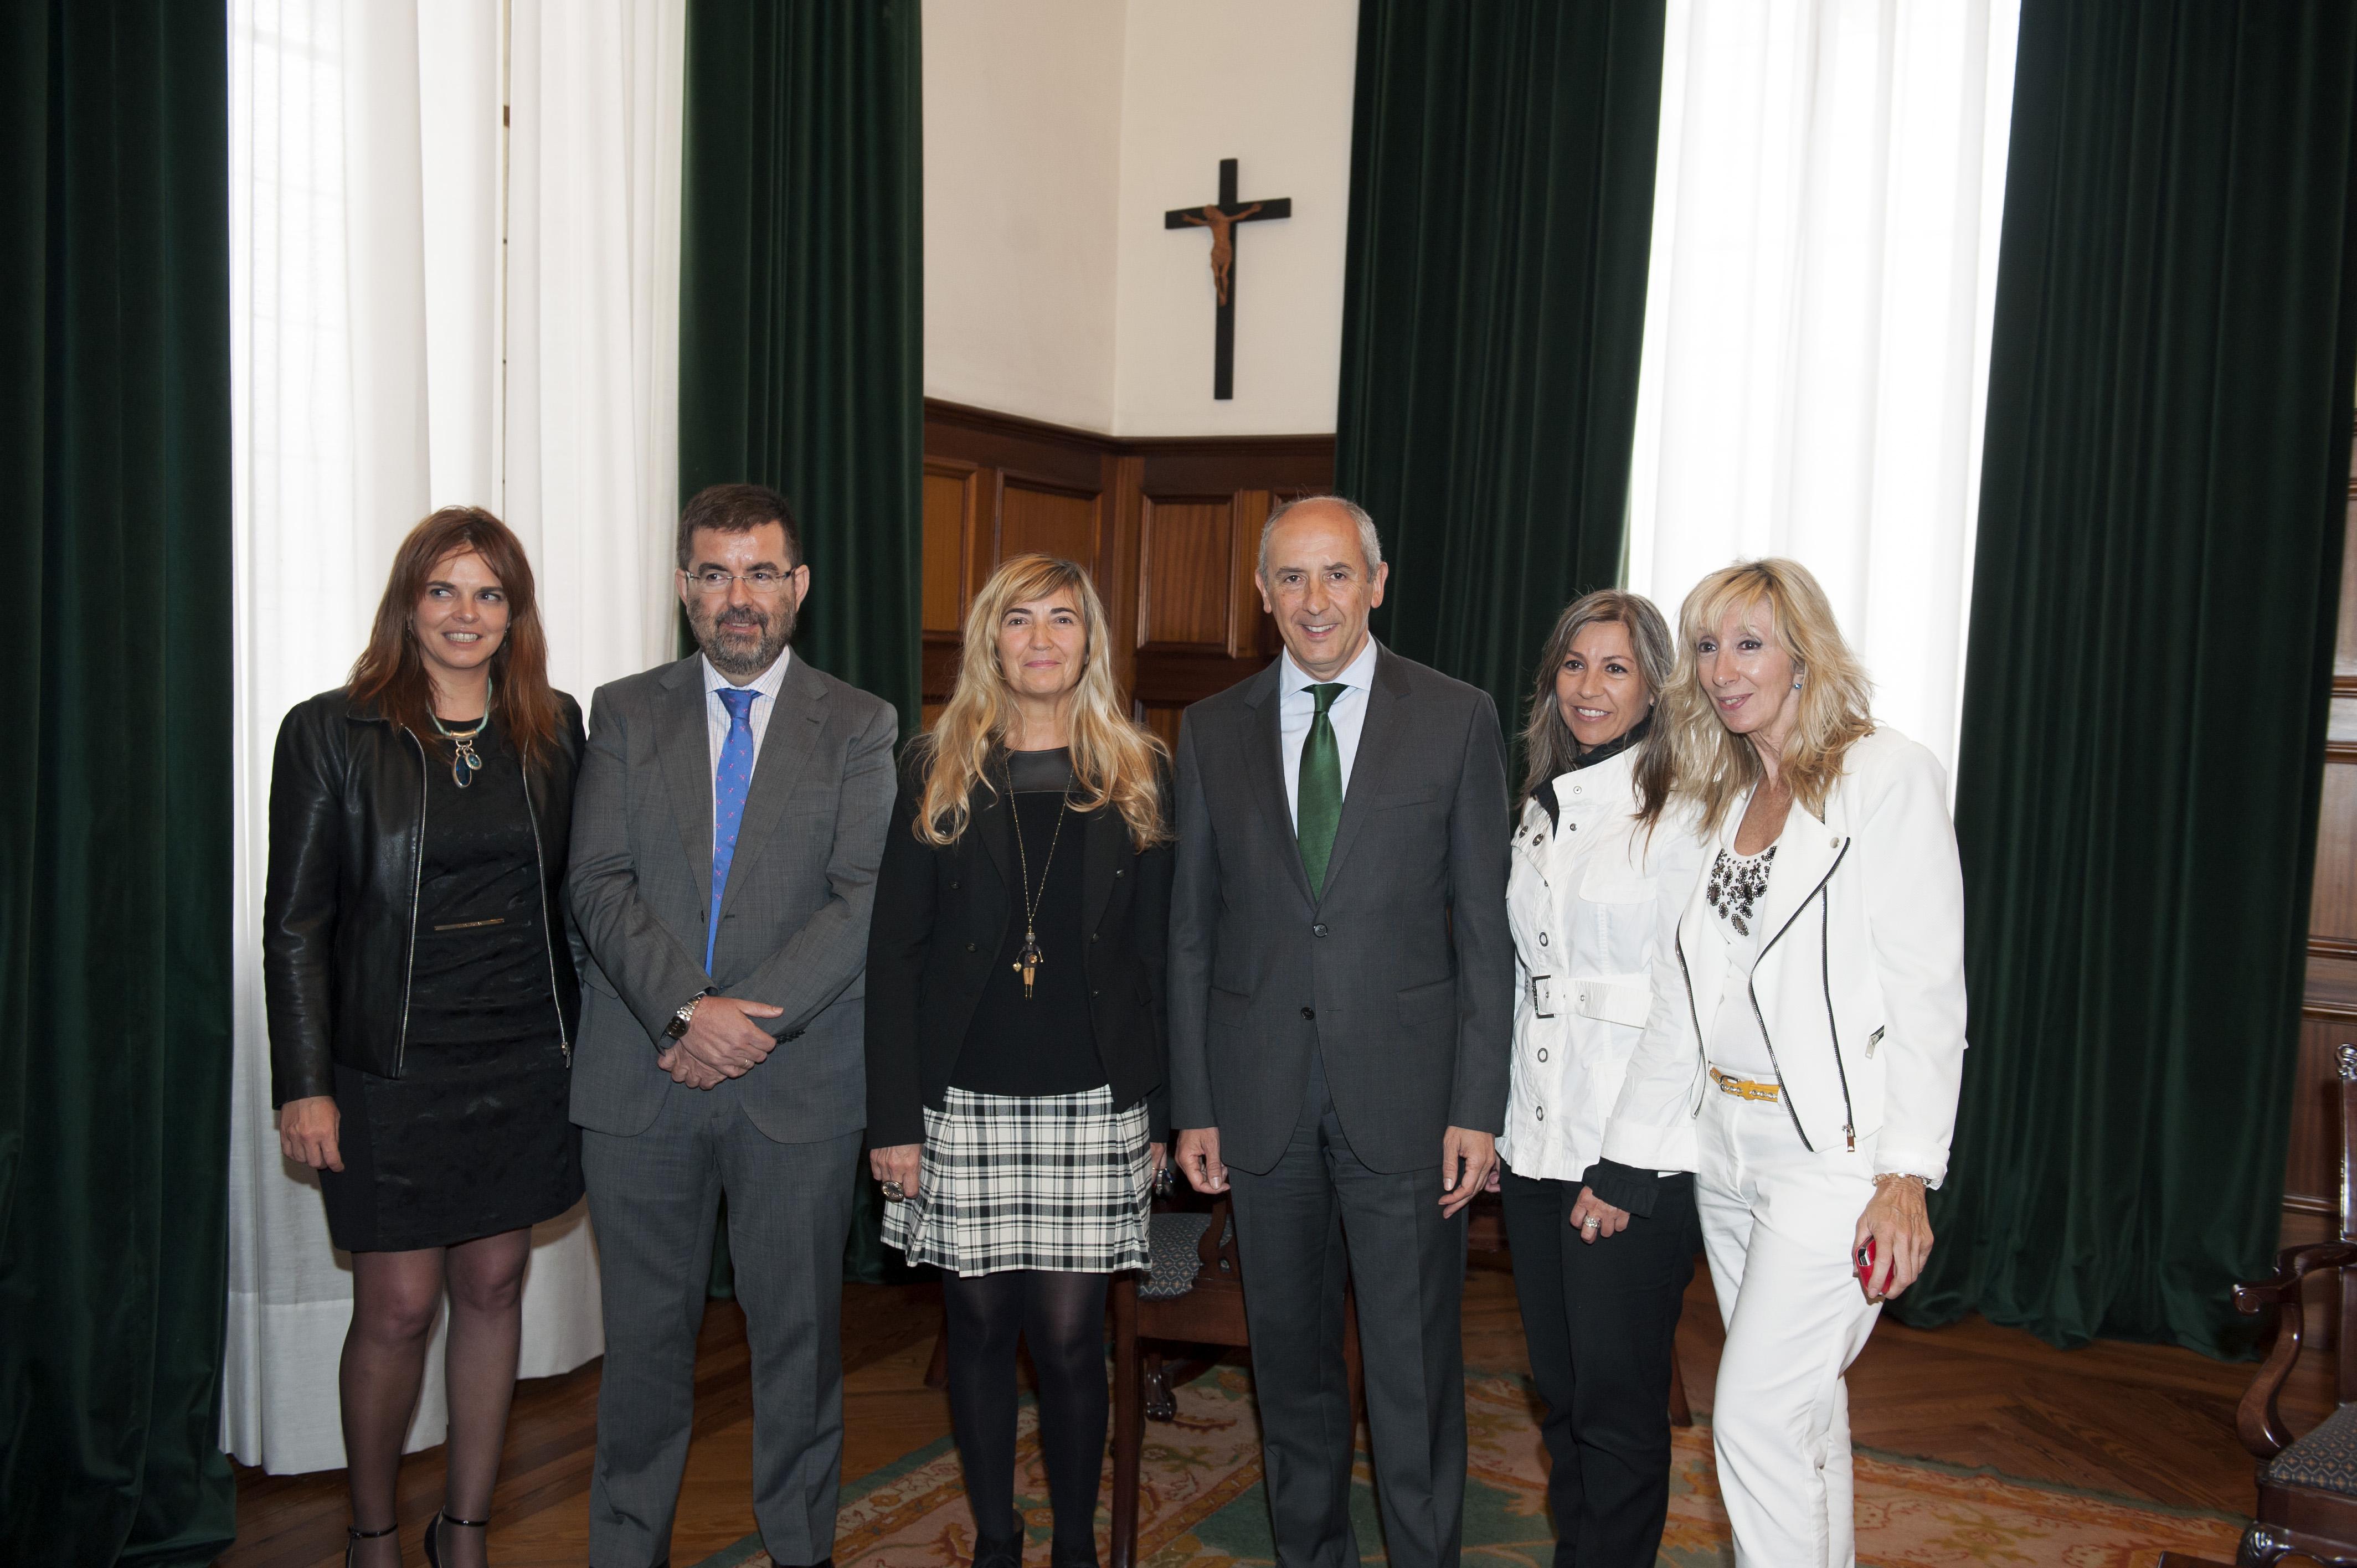 2014_05_22_erkoreka_congreso_mediacion_02.jpg